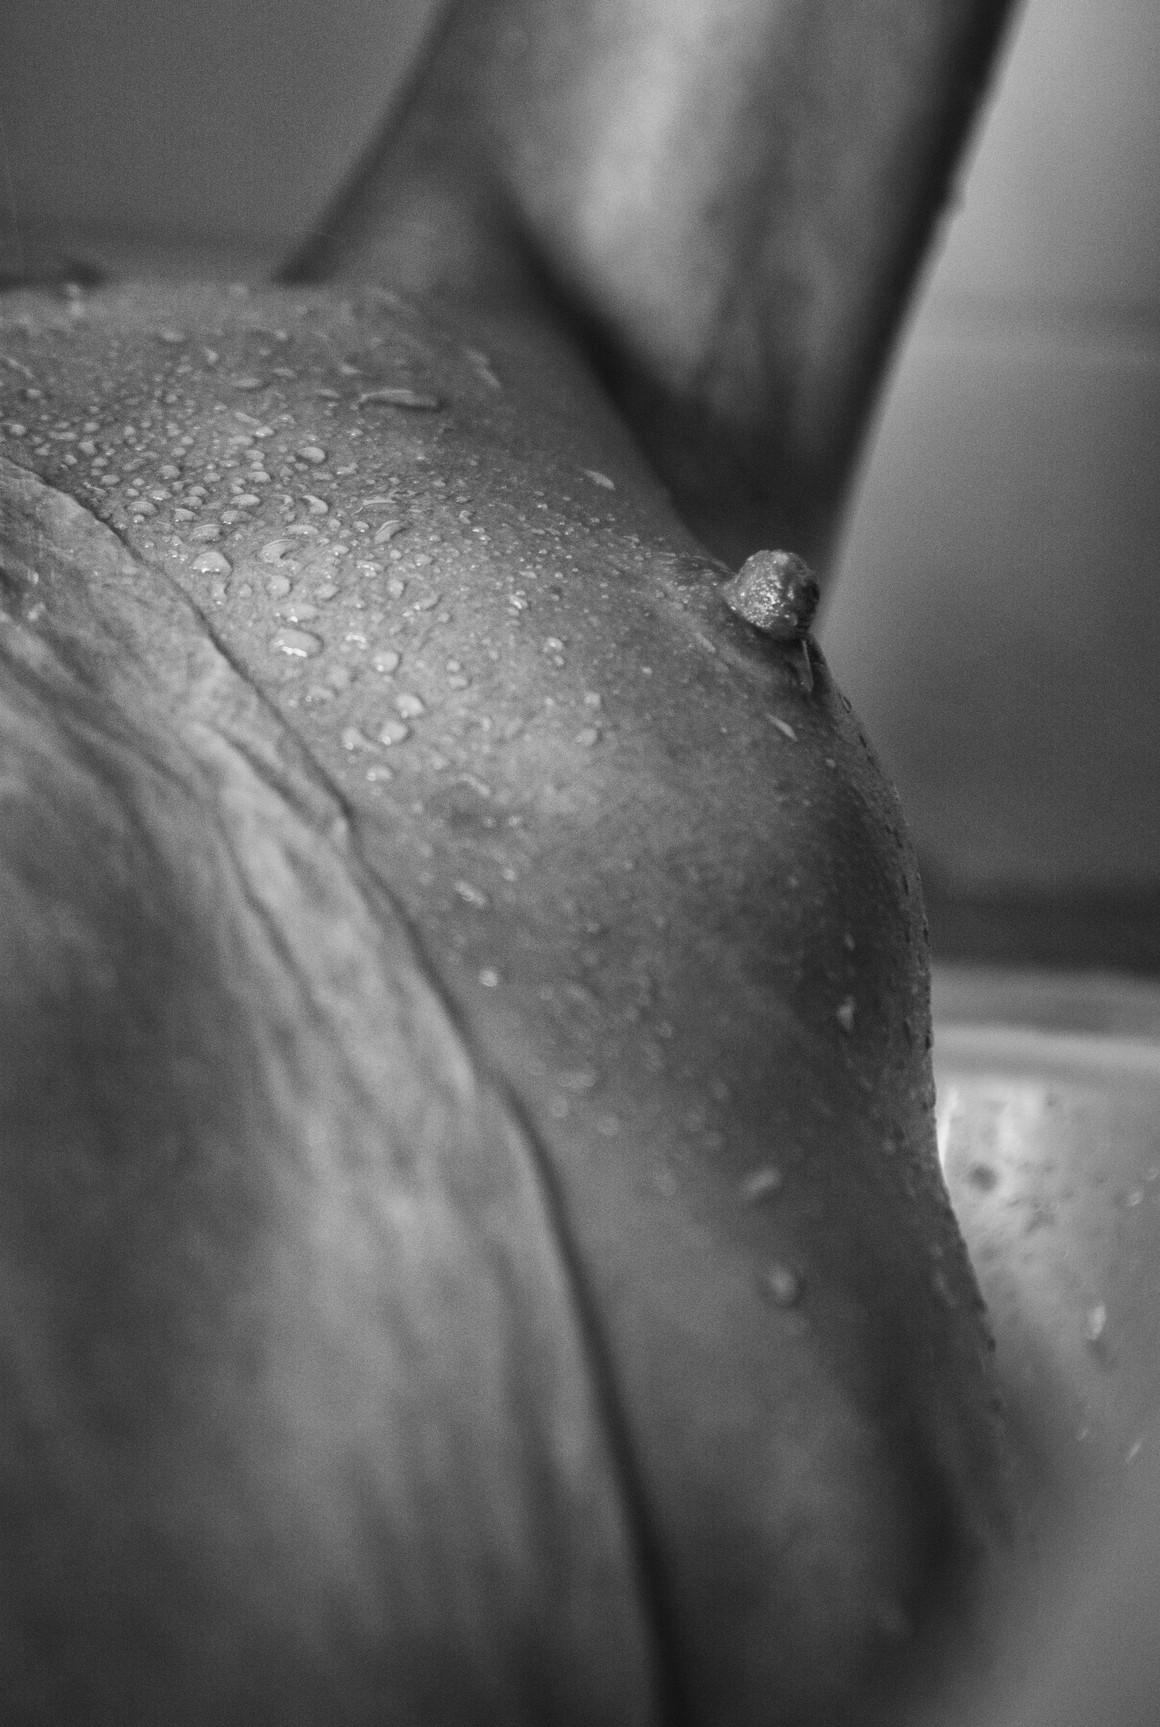 The Nipple